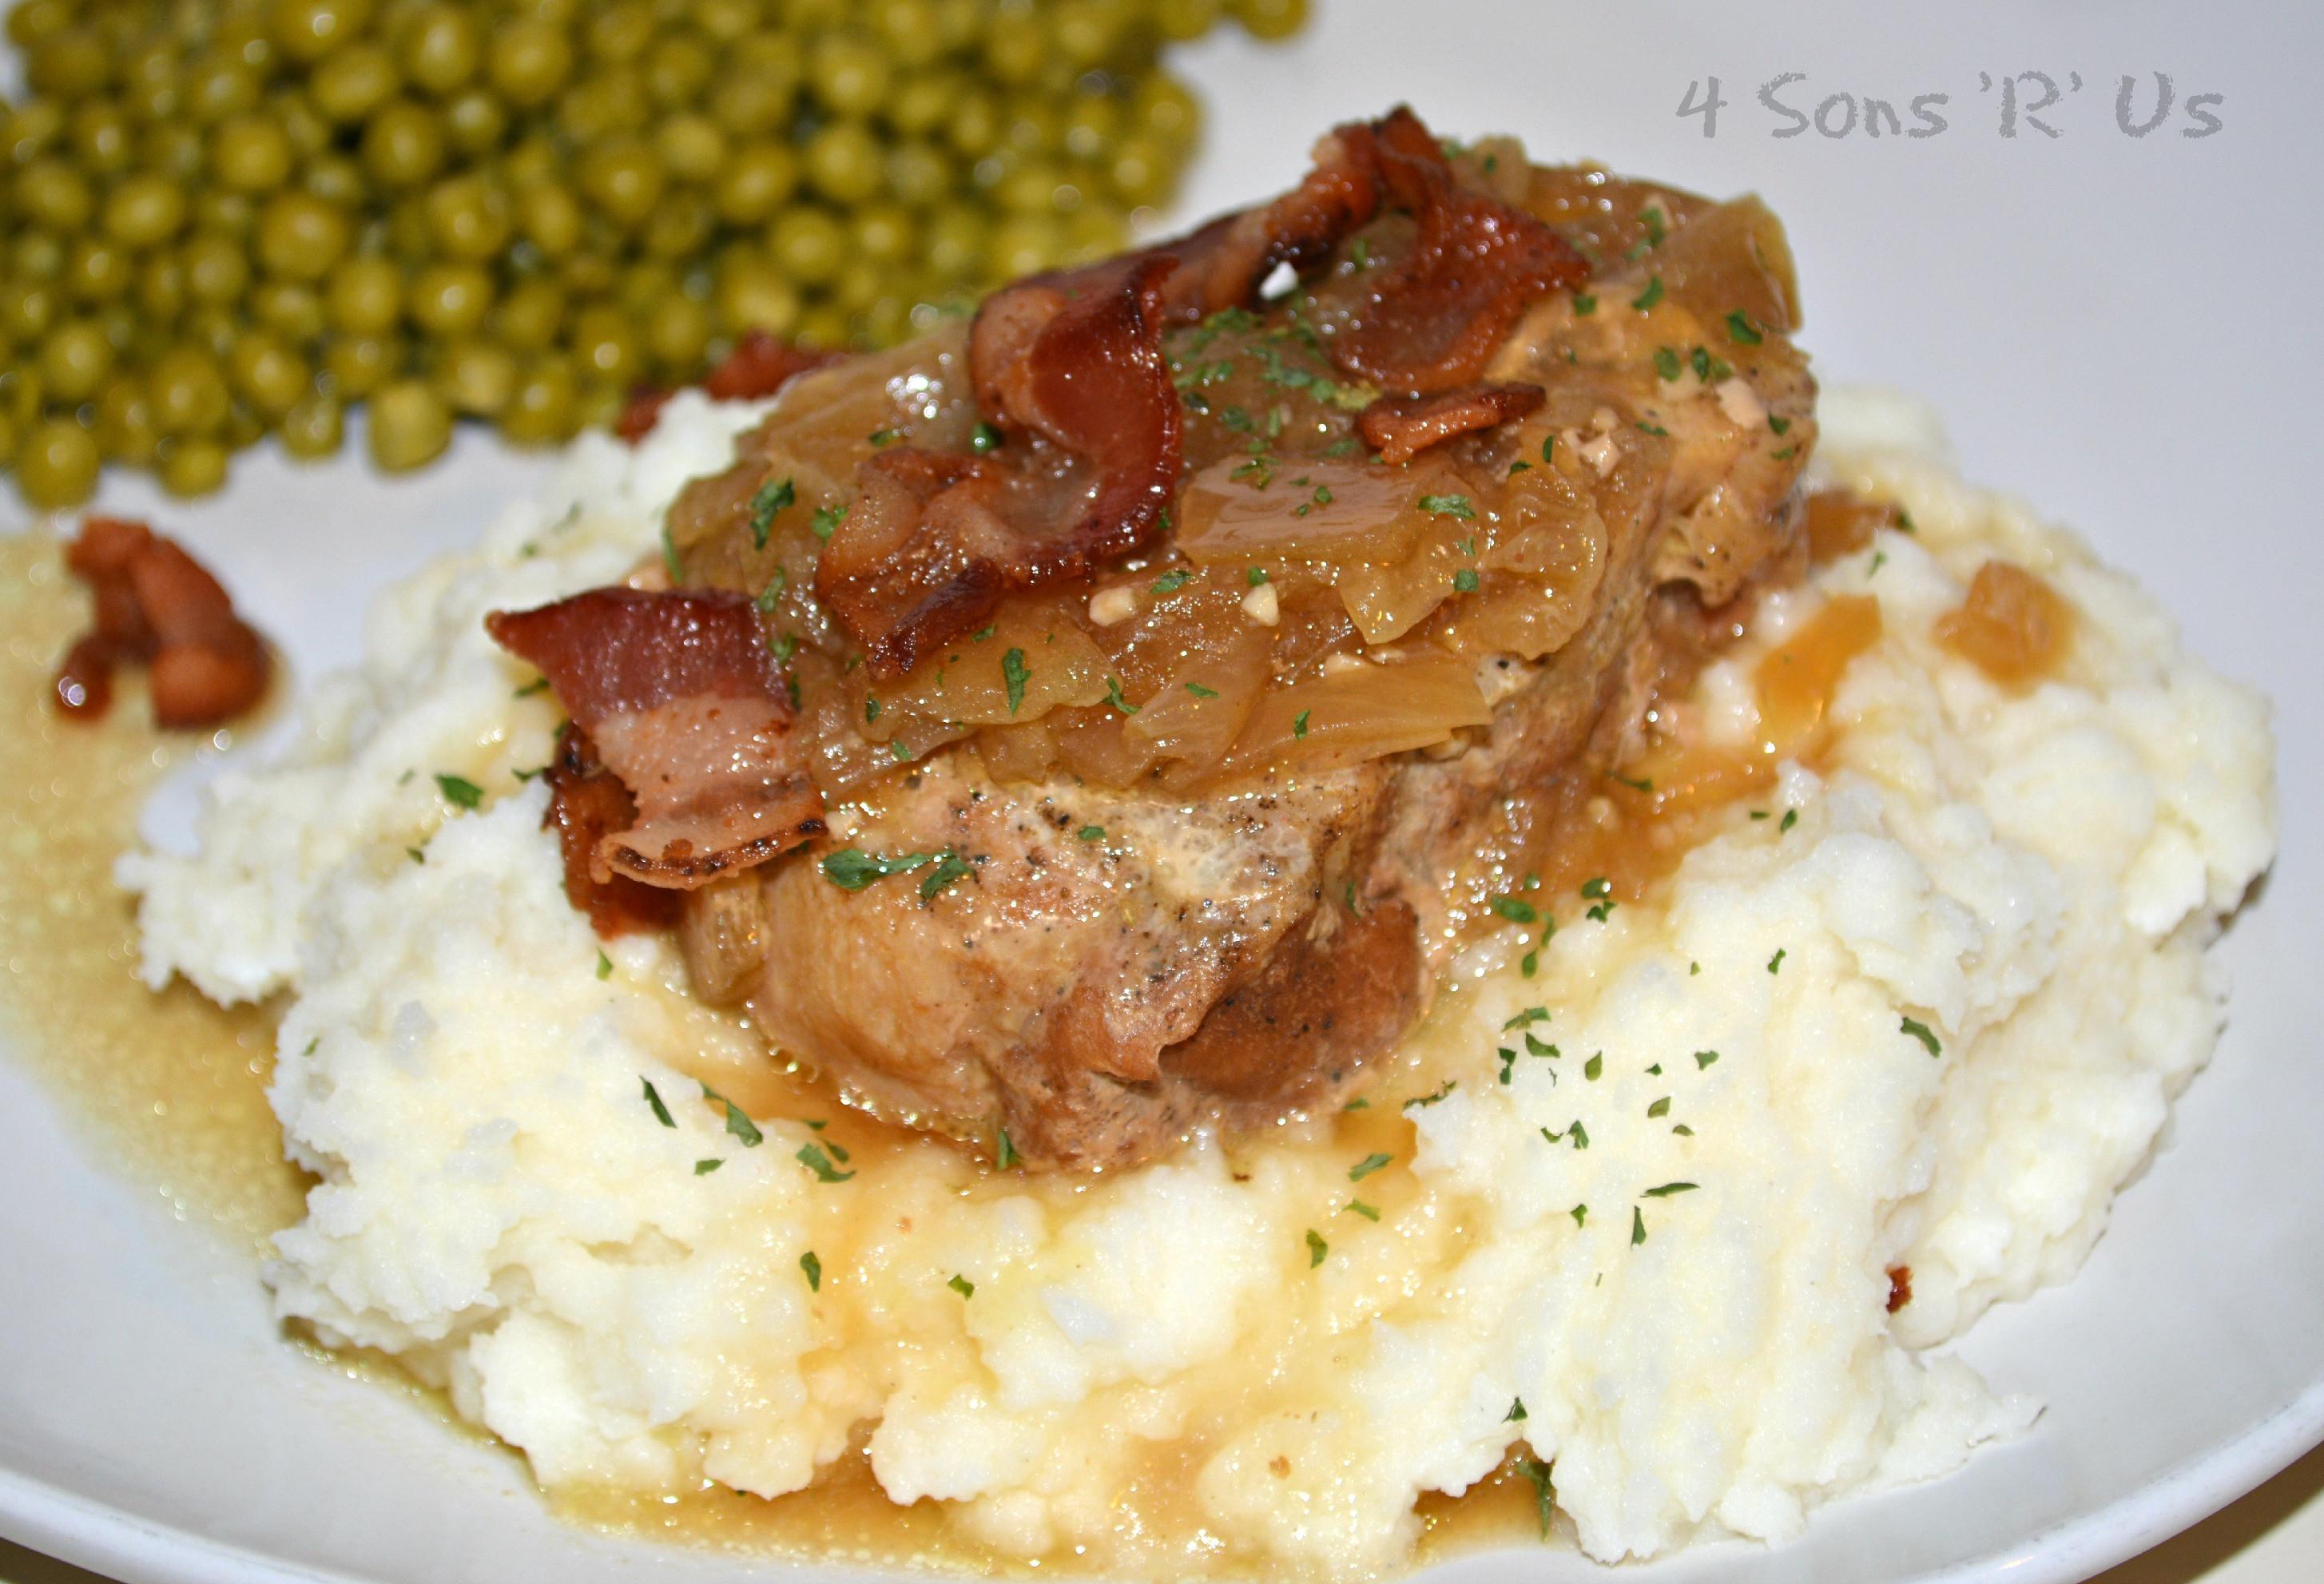 How Long To Cook Pork Chops In Crock Pot  Crockpot Smothered Pork Chops 4 Sons R Us